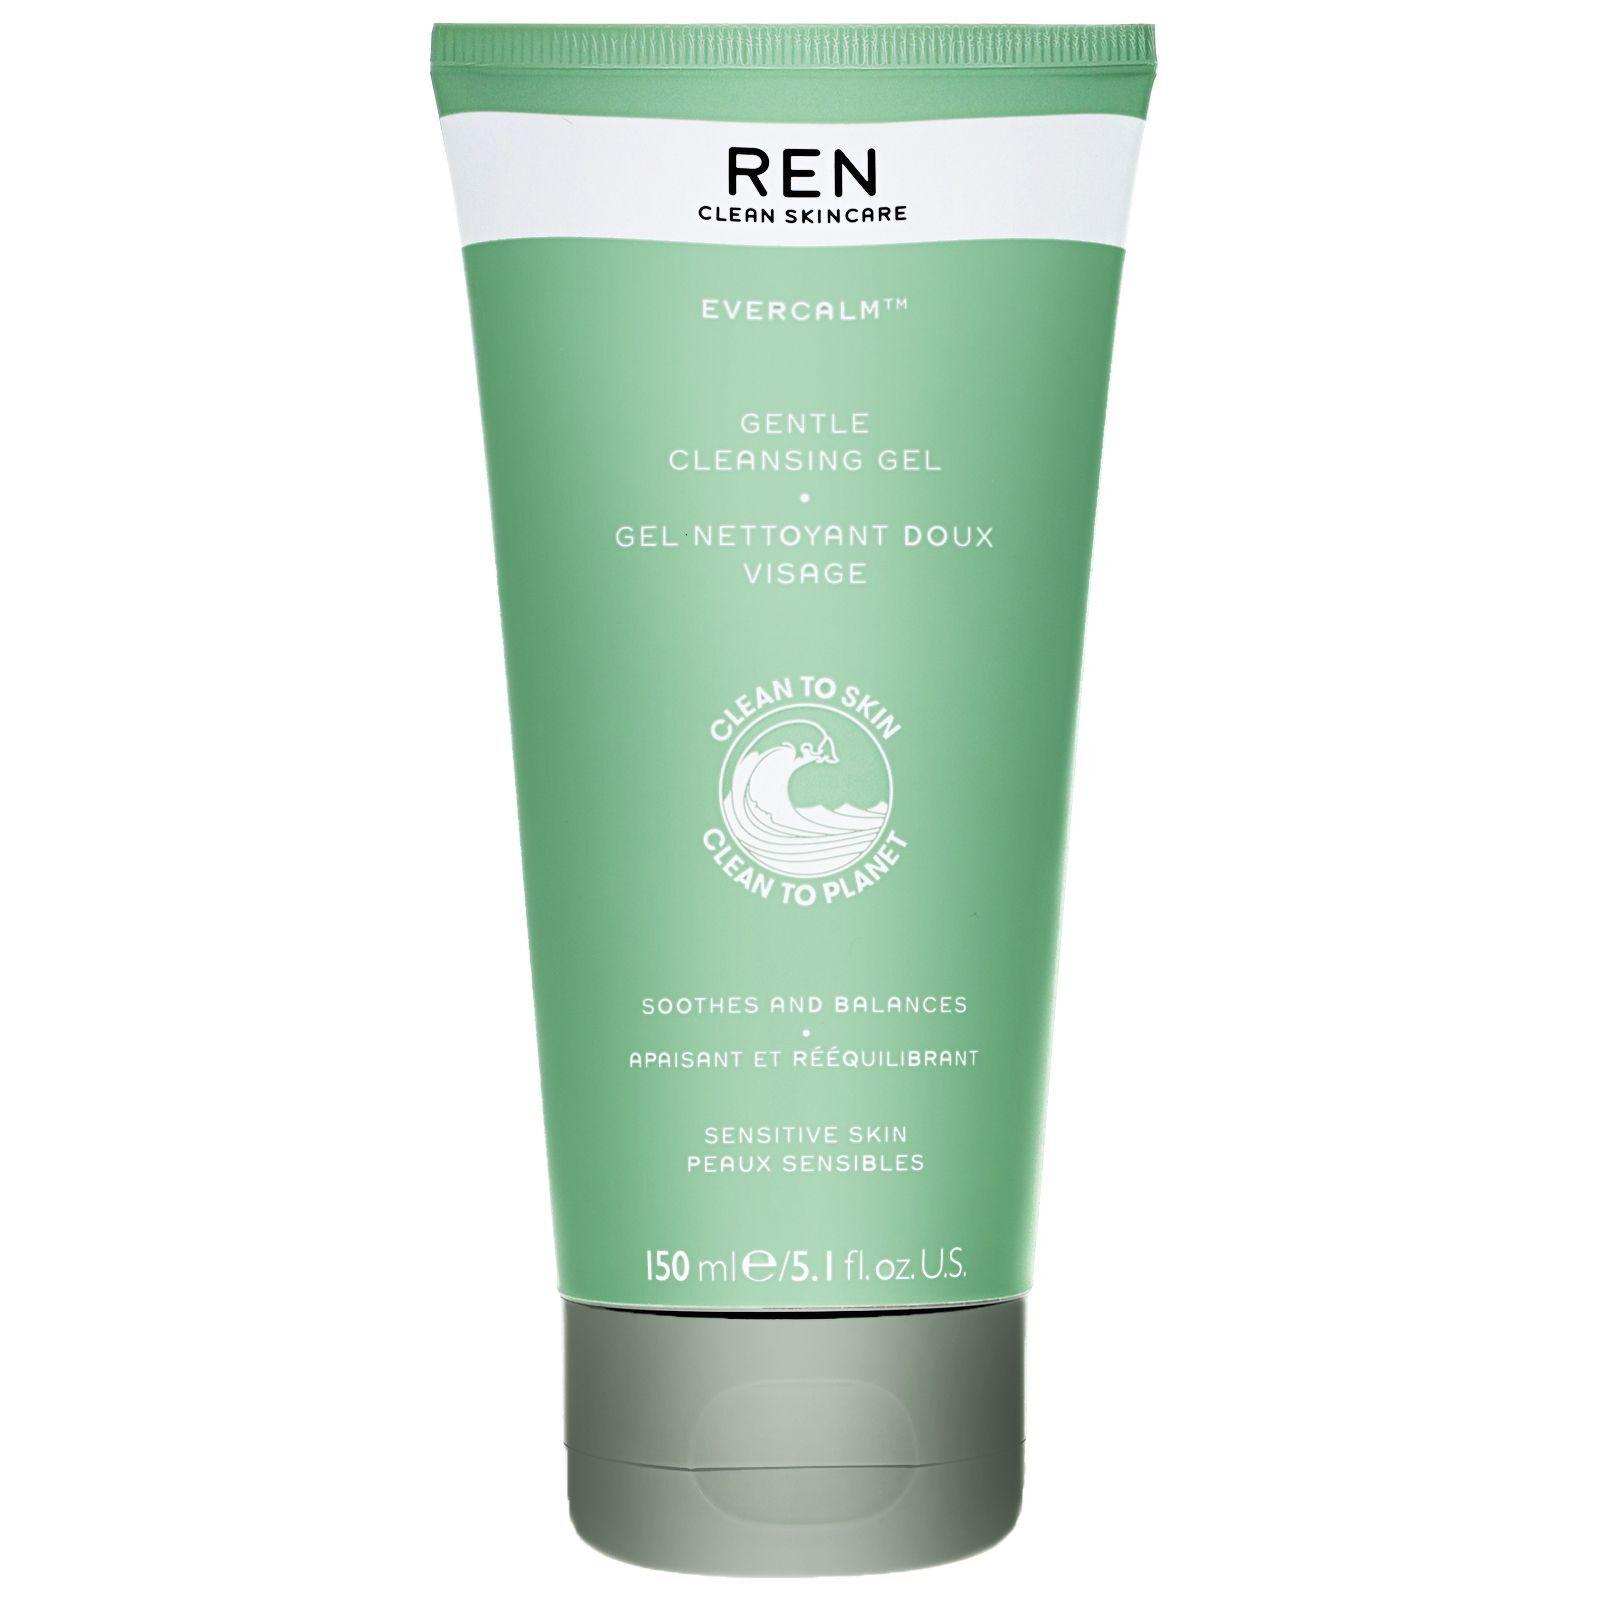 REN Clean Skincare - Face Evercalm Gentle Cleansing Gel 150ml / 5.1 fl.oz.  for Women